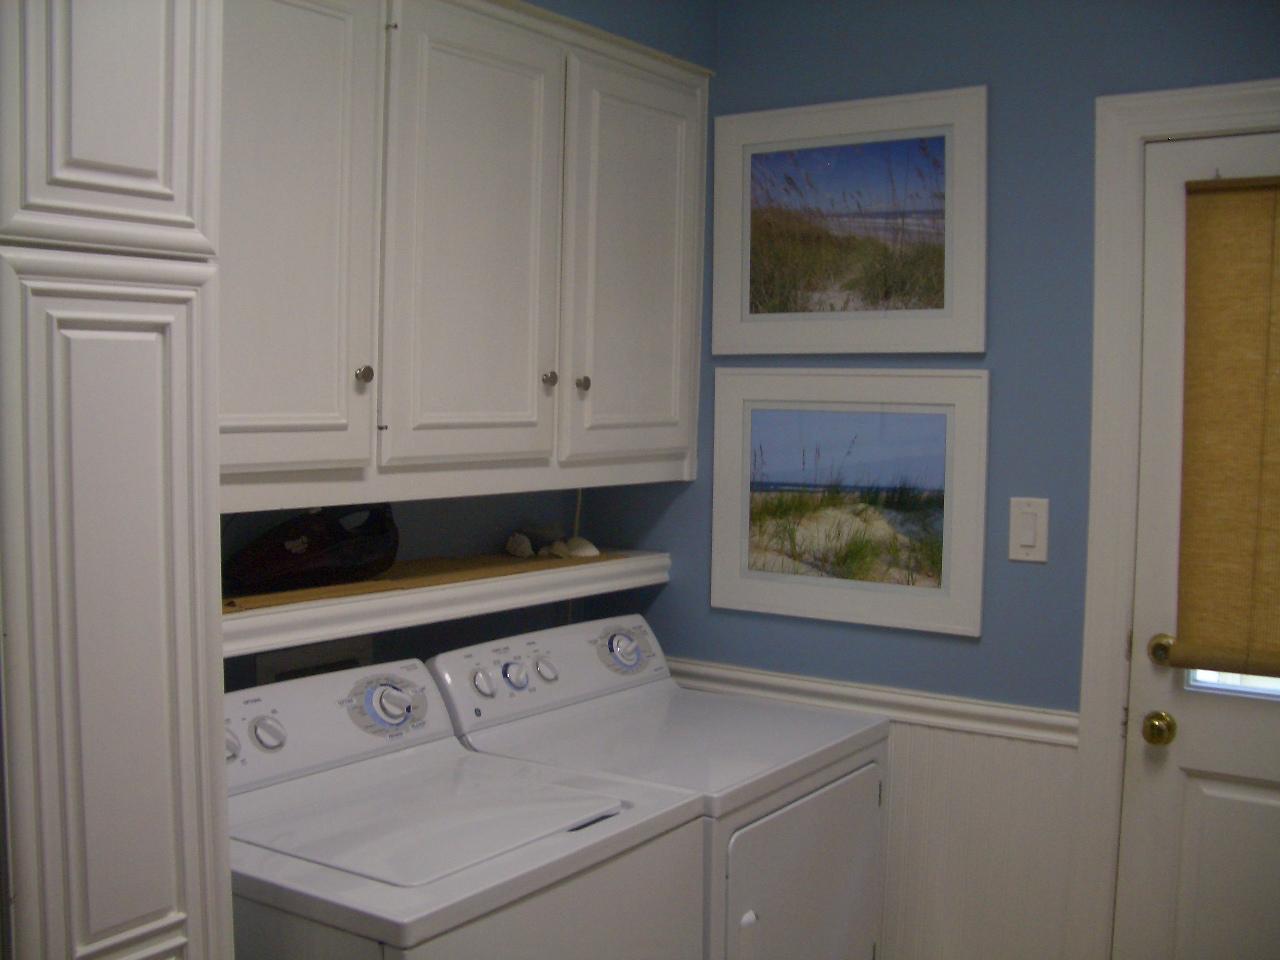 Storage Shelf Over Washer And Dryer Photos